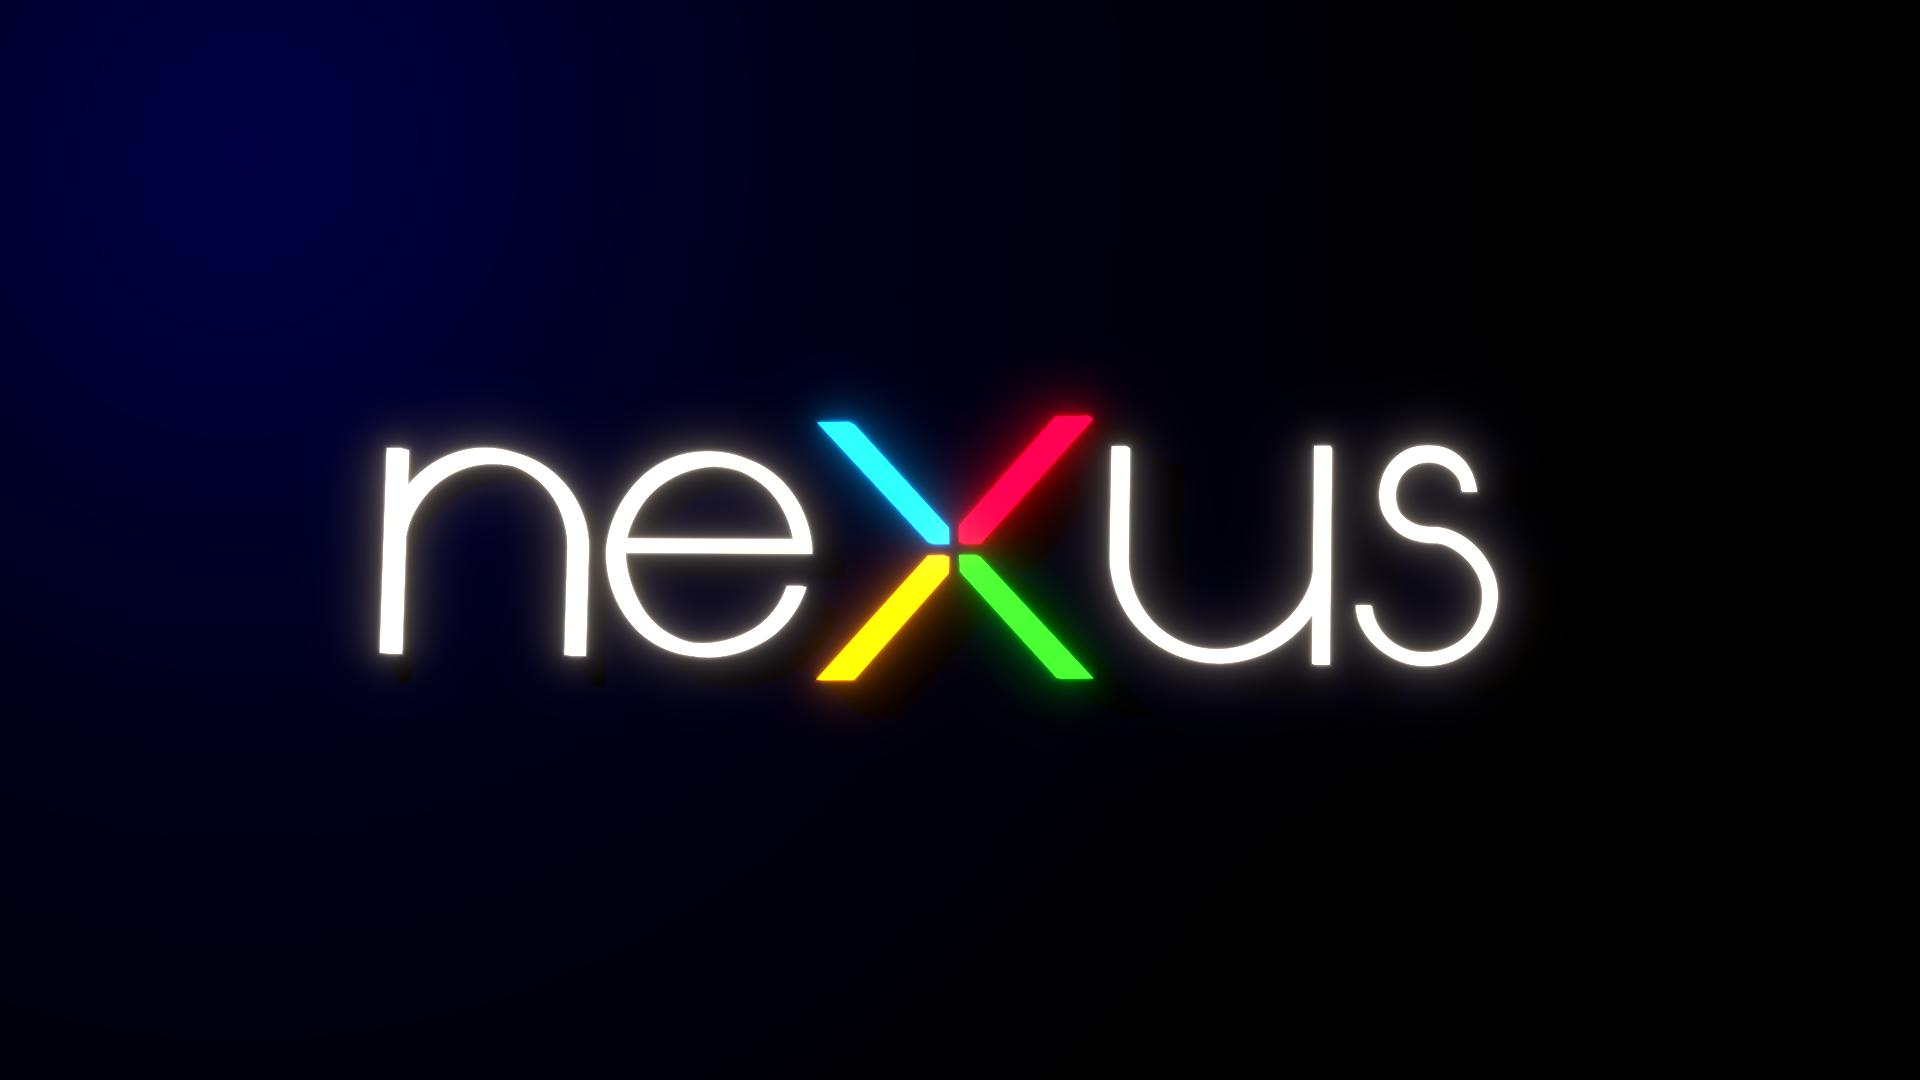 Logotipo de Google Nexus